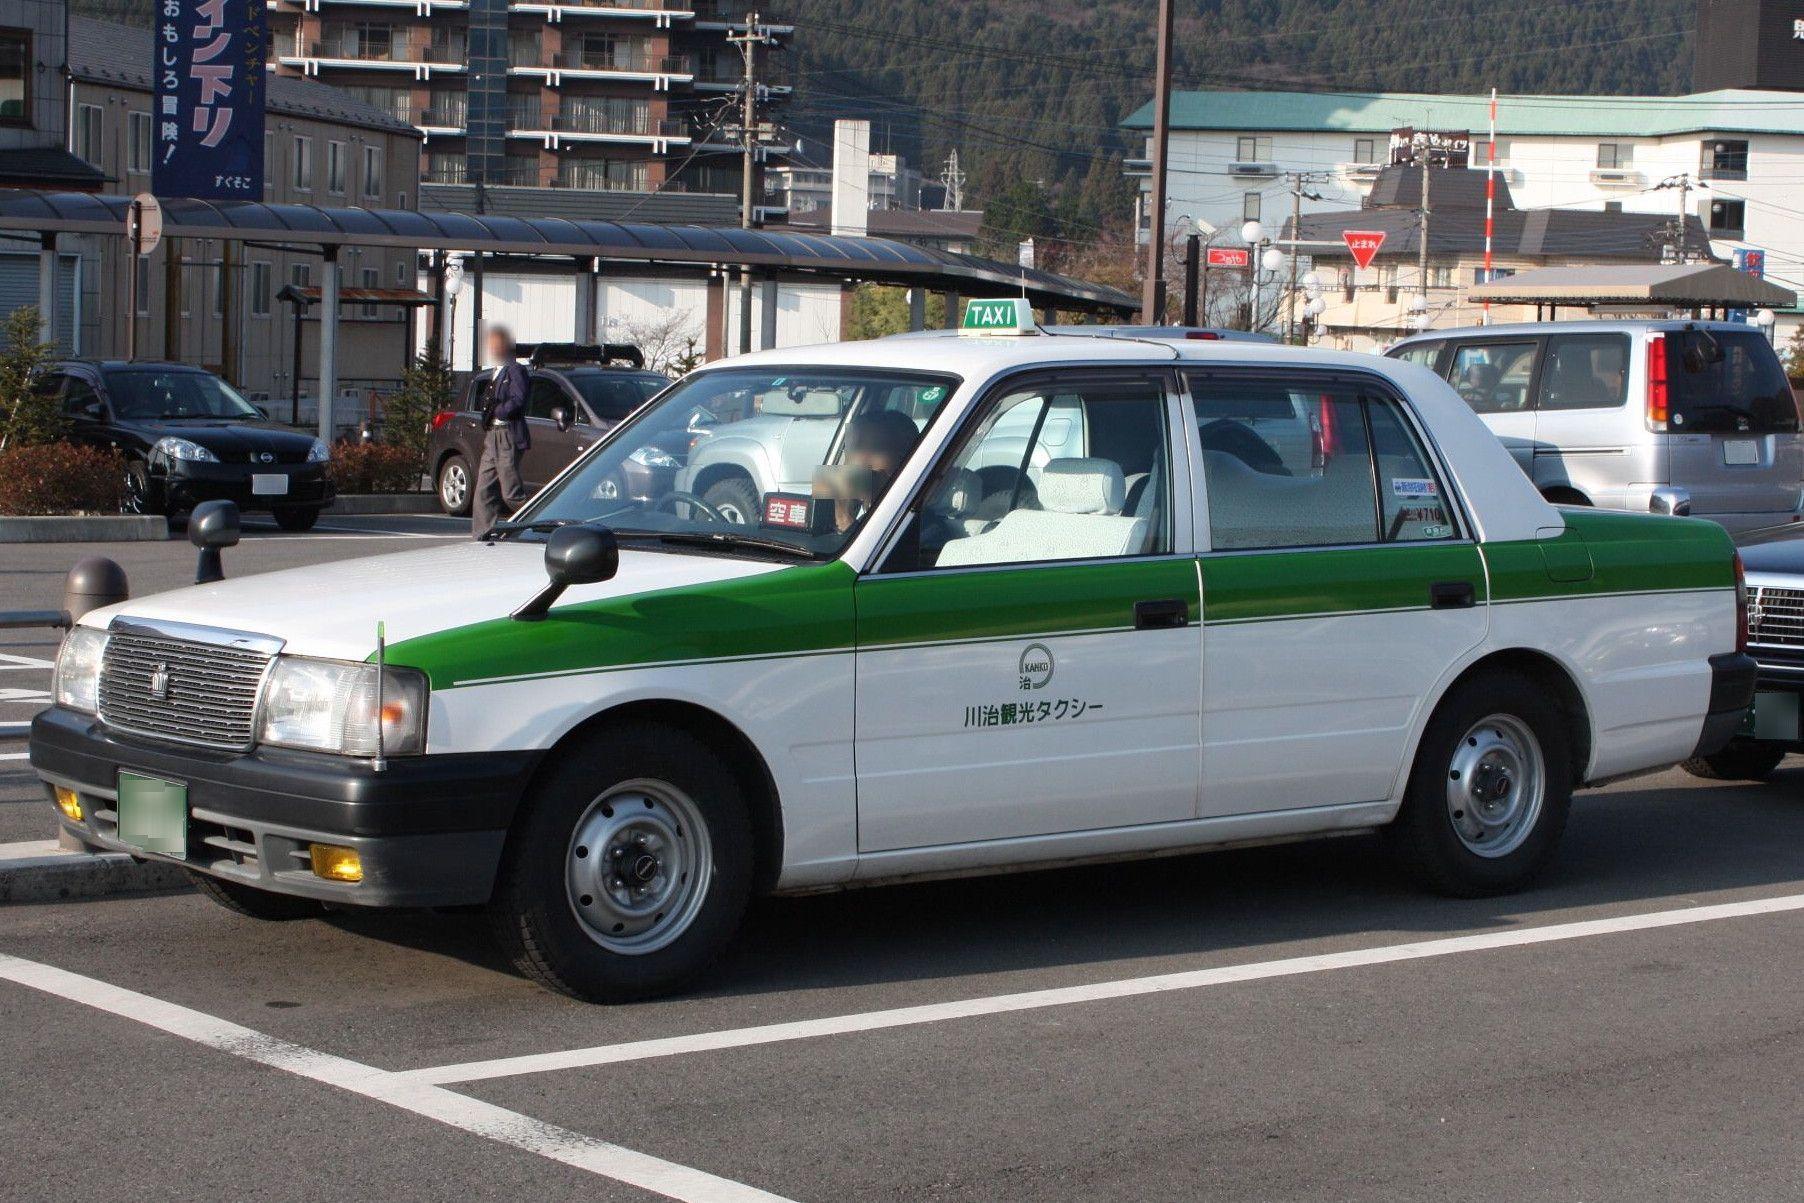 File:Kawaji kanko Taxi Crown Comfort.JPG - Wikimedia Commons